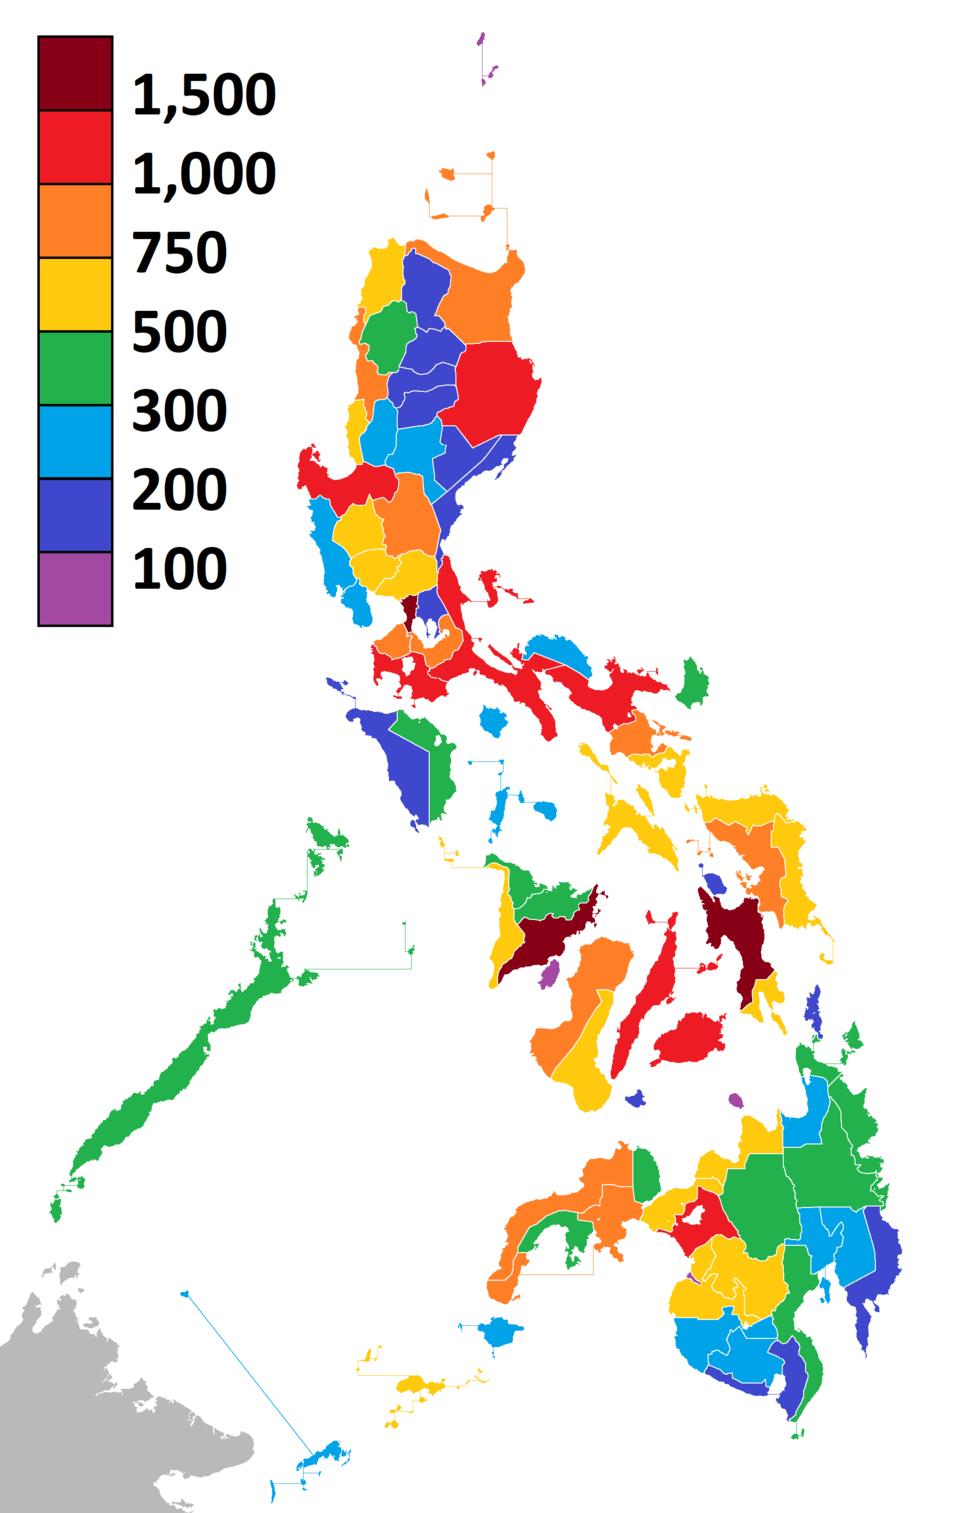 Number of barangays per province